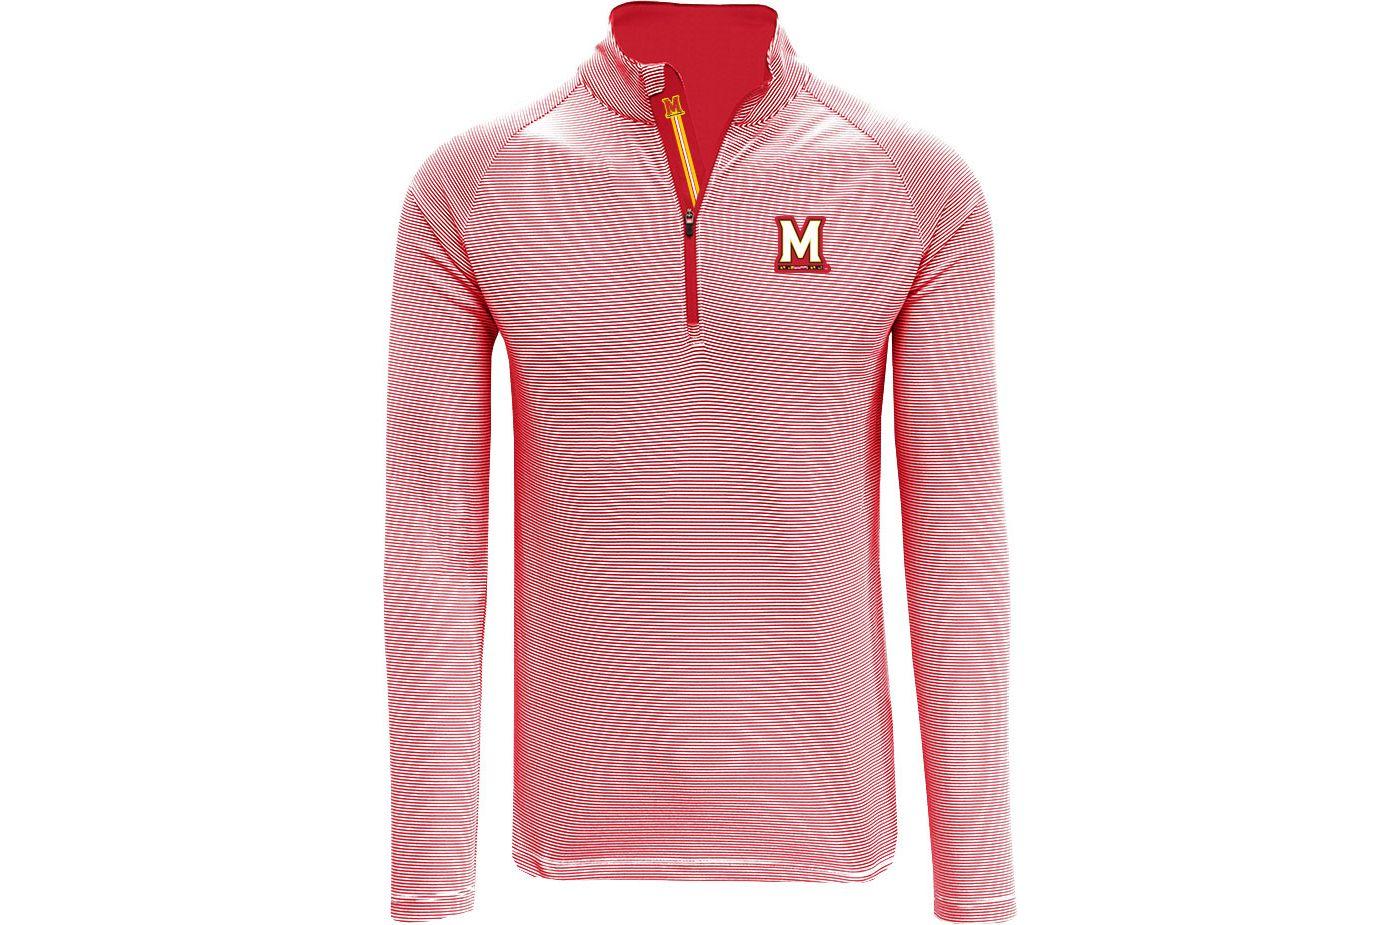 Levelwear Men's Maryland Terrapins Red Orion Quarter-Zip Shirt